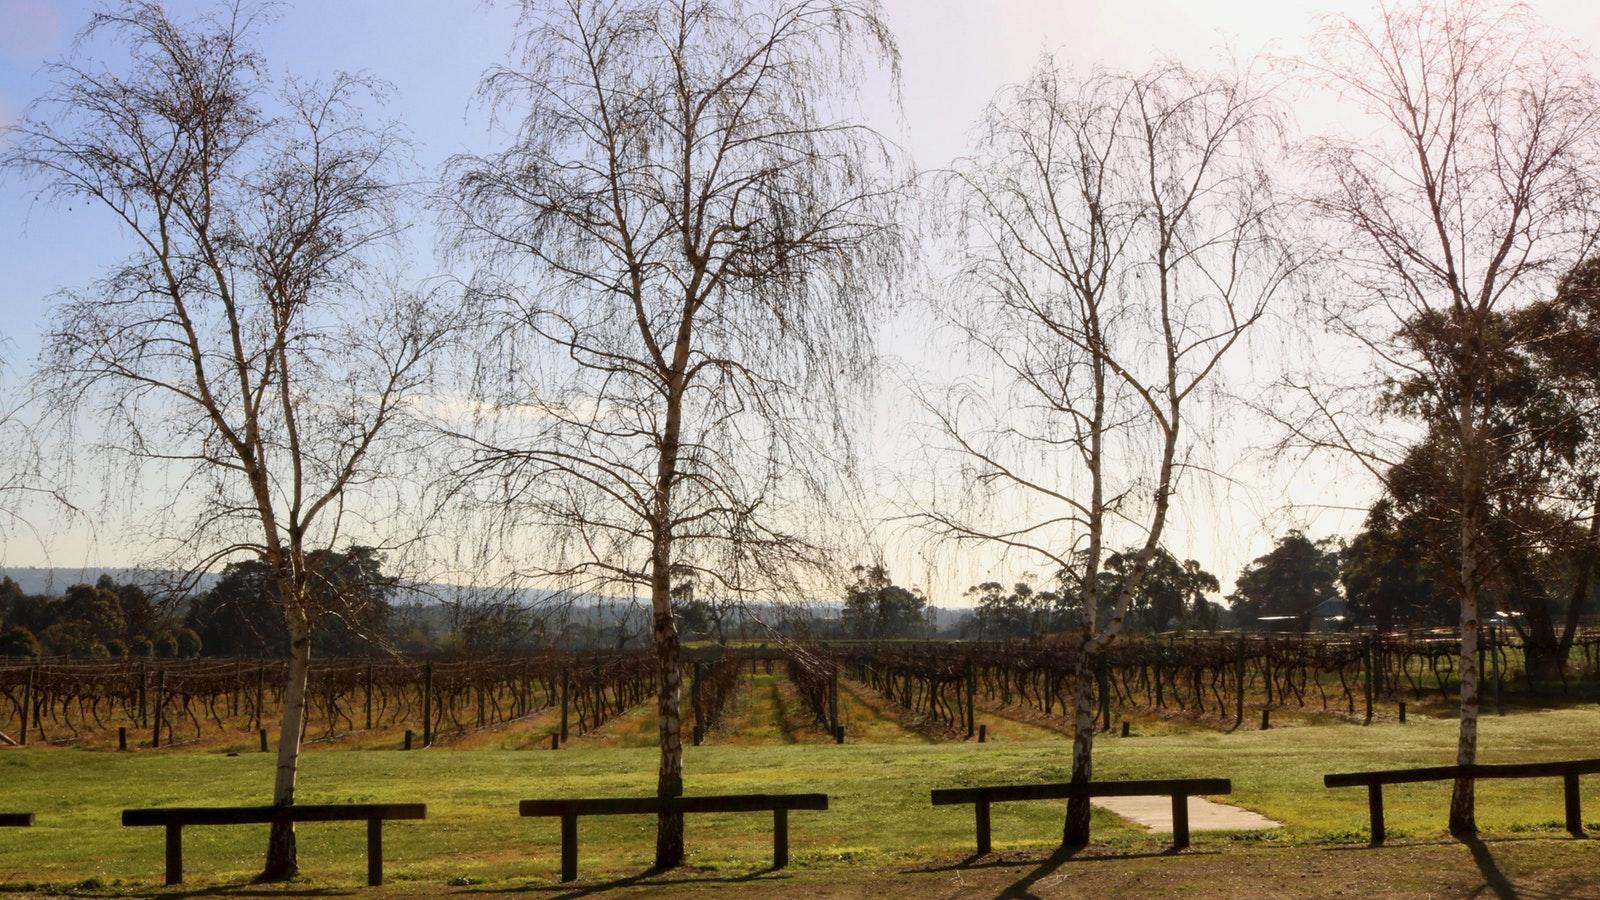 Winter vineyard with Beech trees